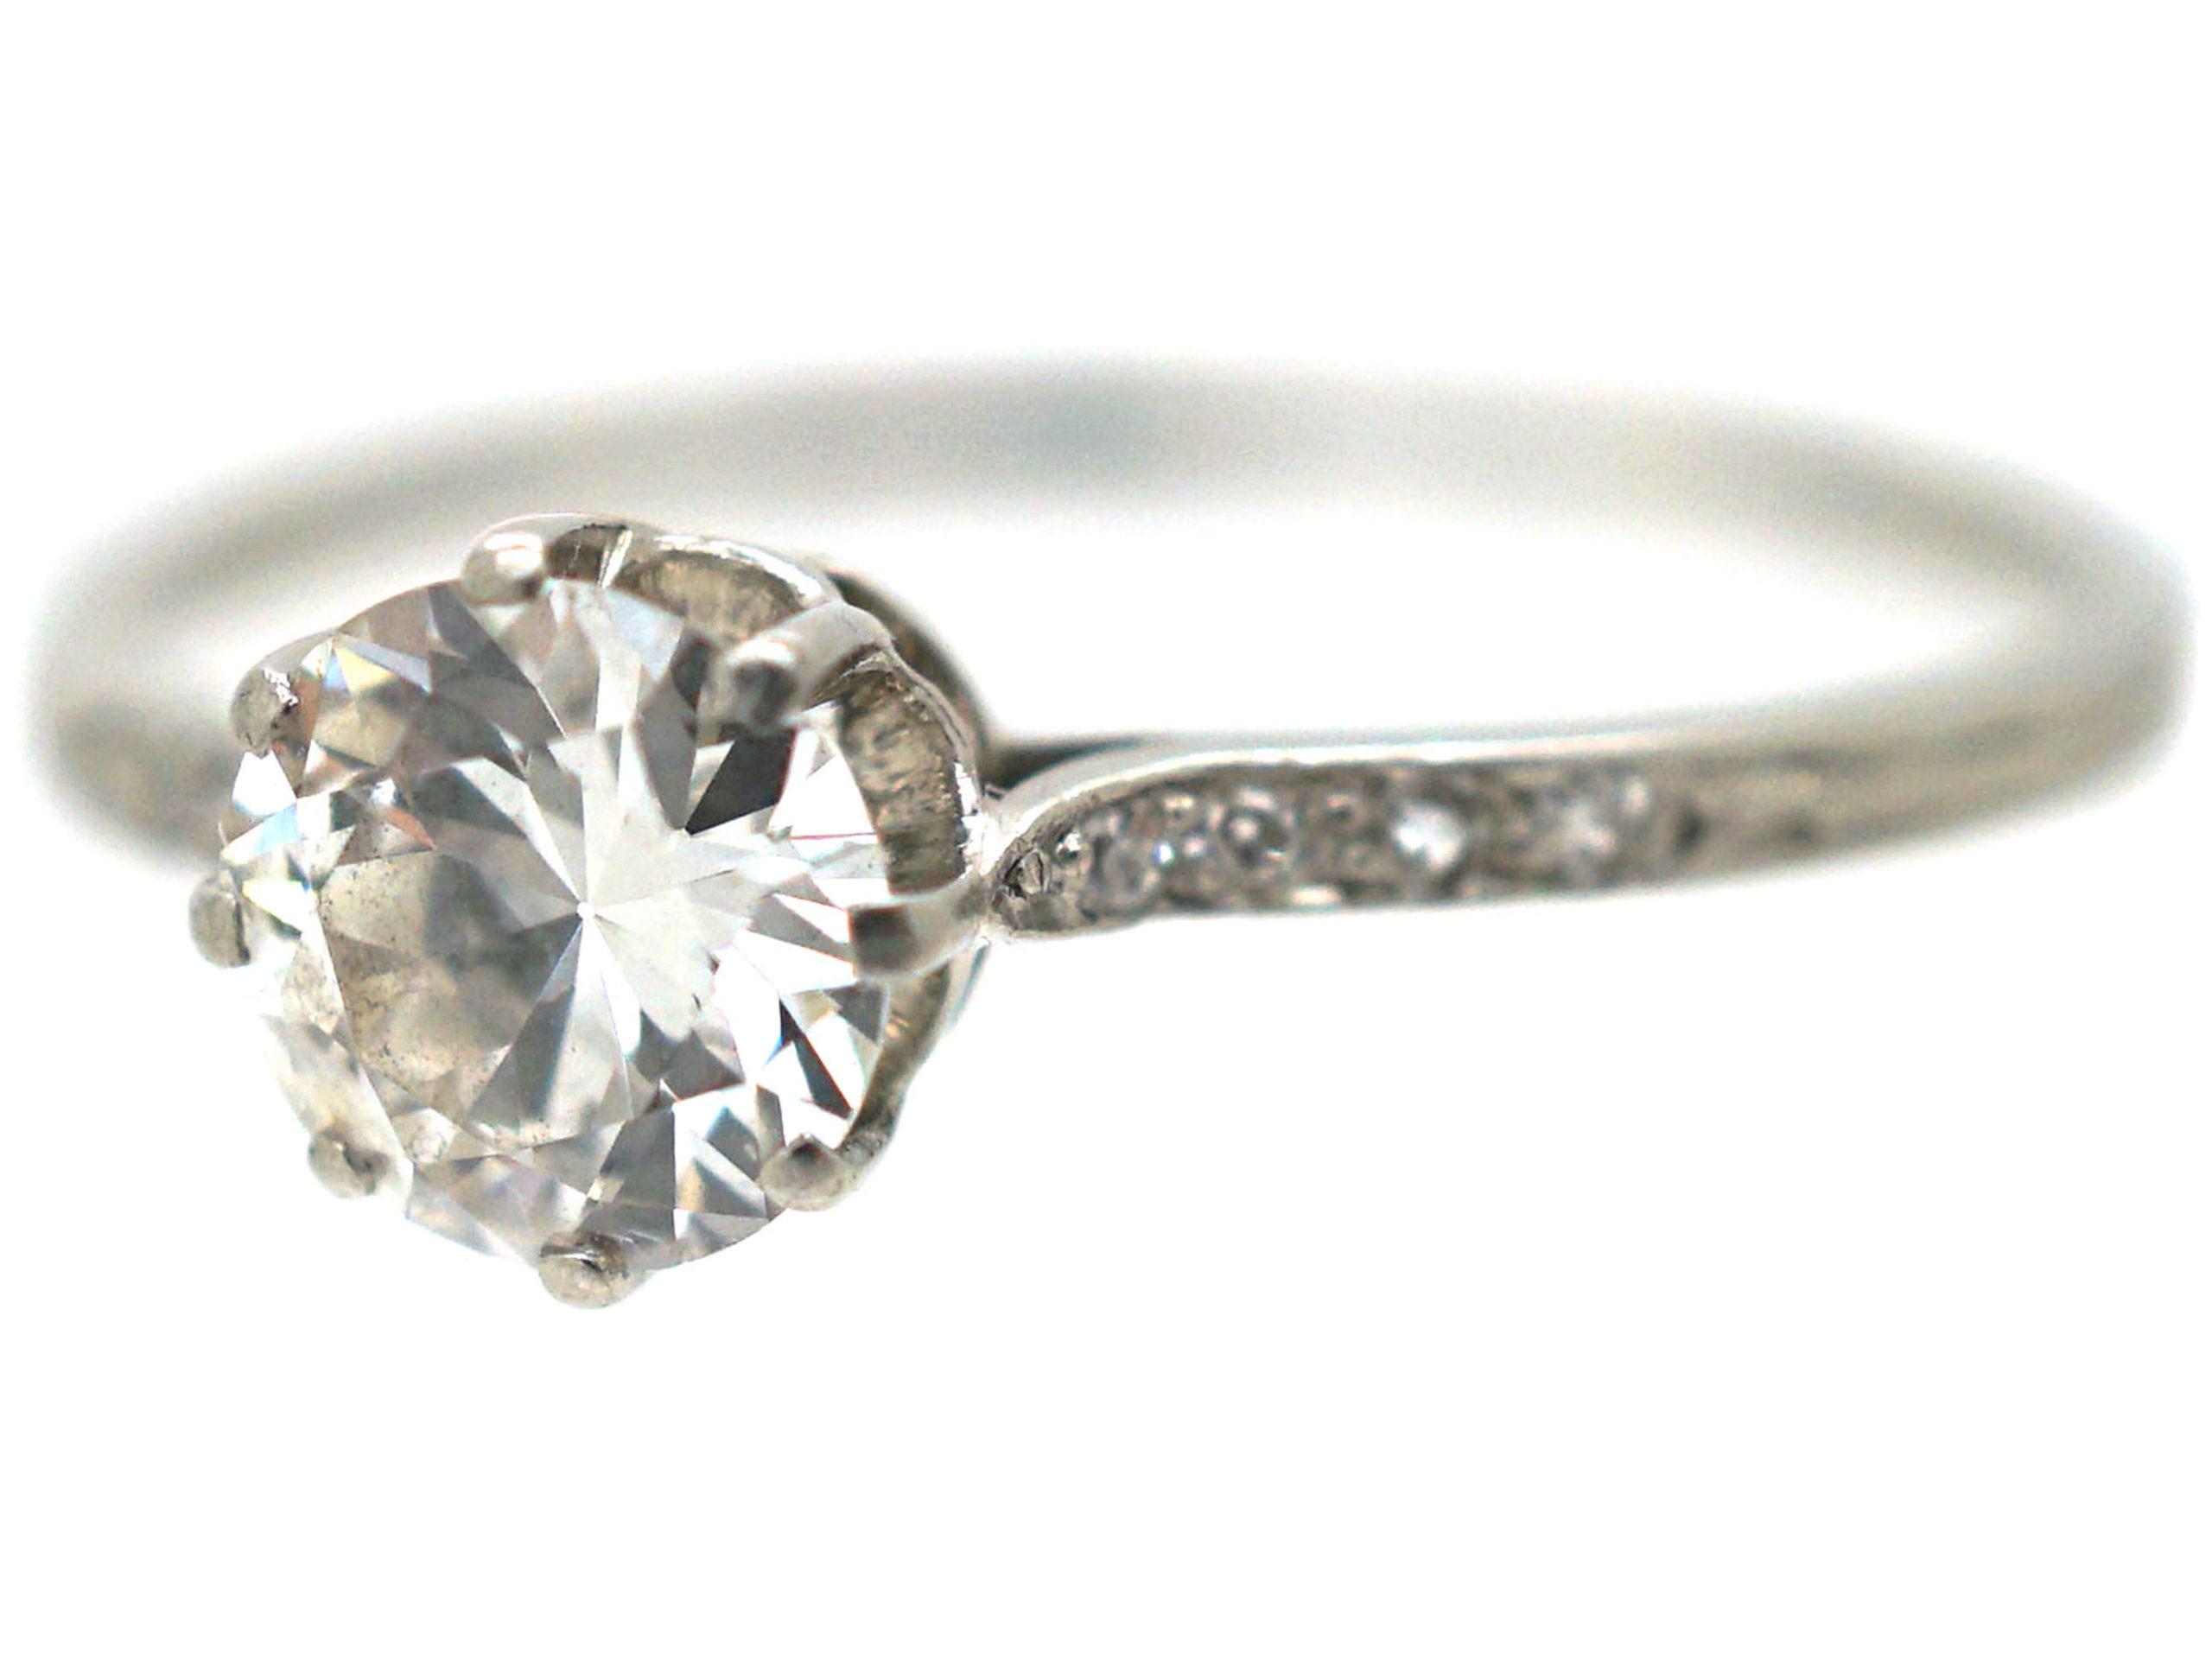 Edwardian Platinum & Diamond Solitaire Ring with Diamond set Shoulders